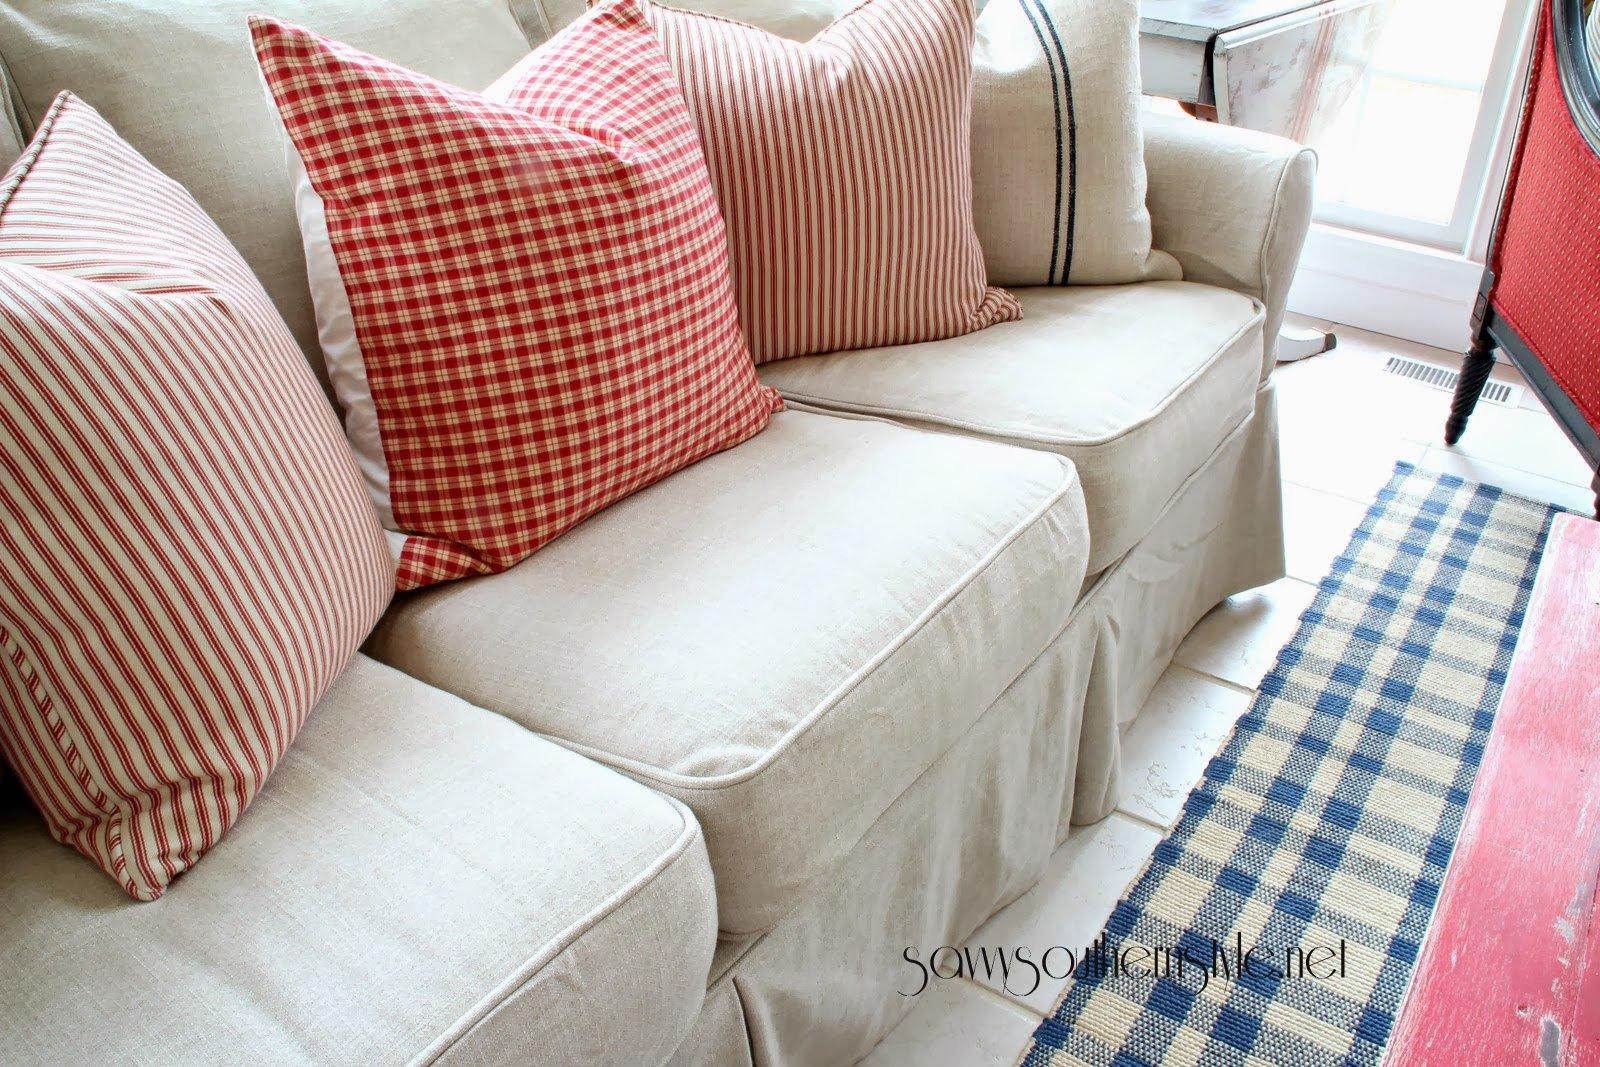 Savvysouthernstyle PB Basic sofa in Kino Natural